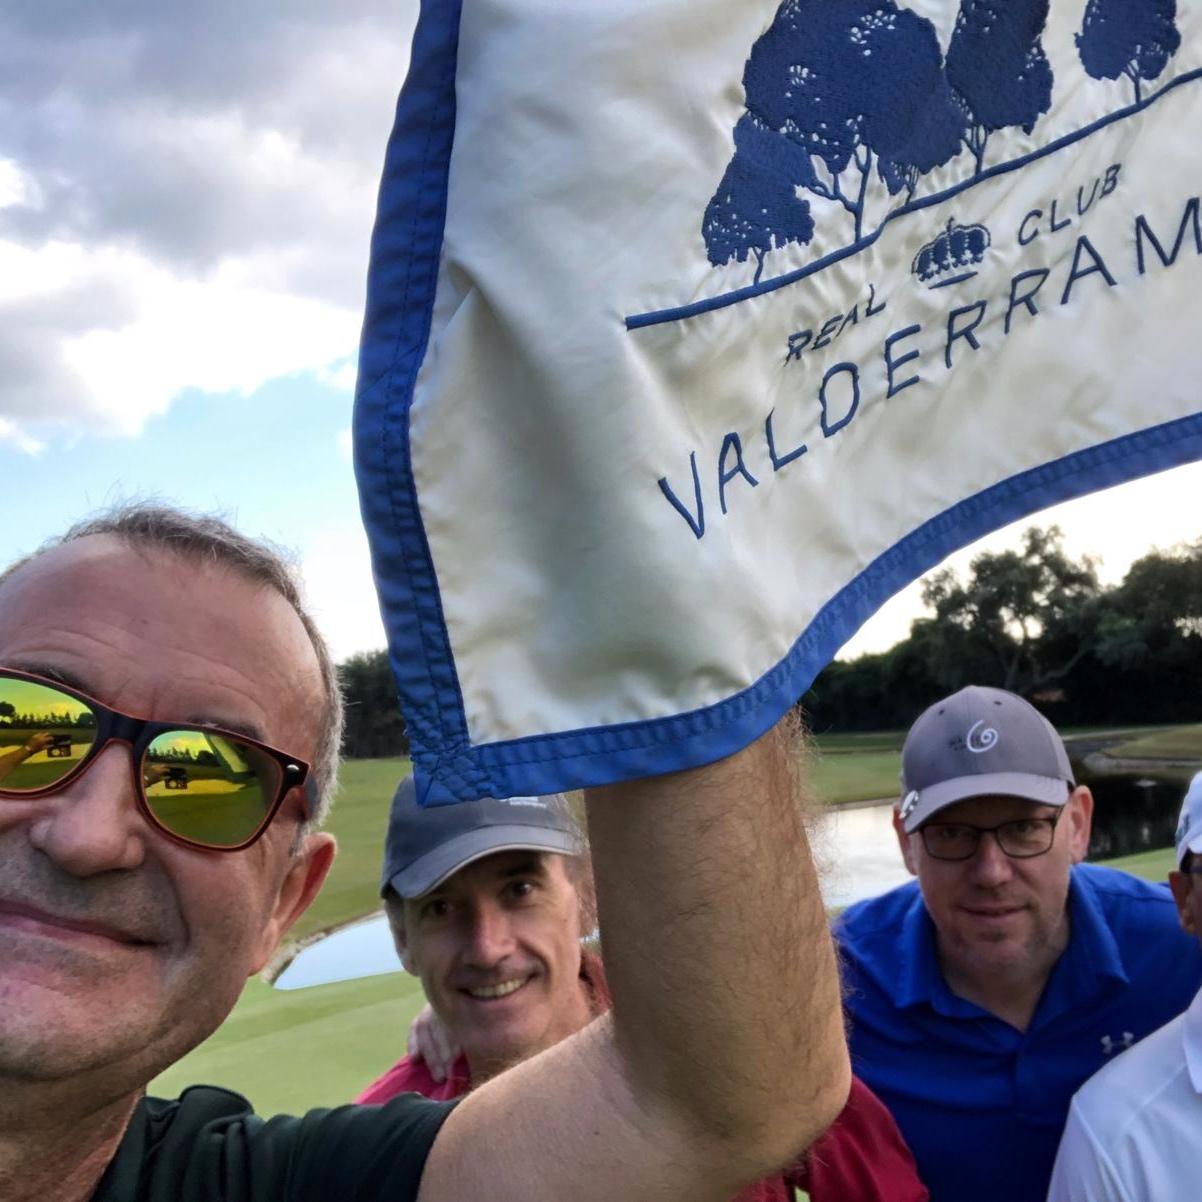 Mr. Buzzy @ Valderrama Golf club, spain